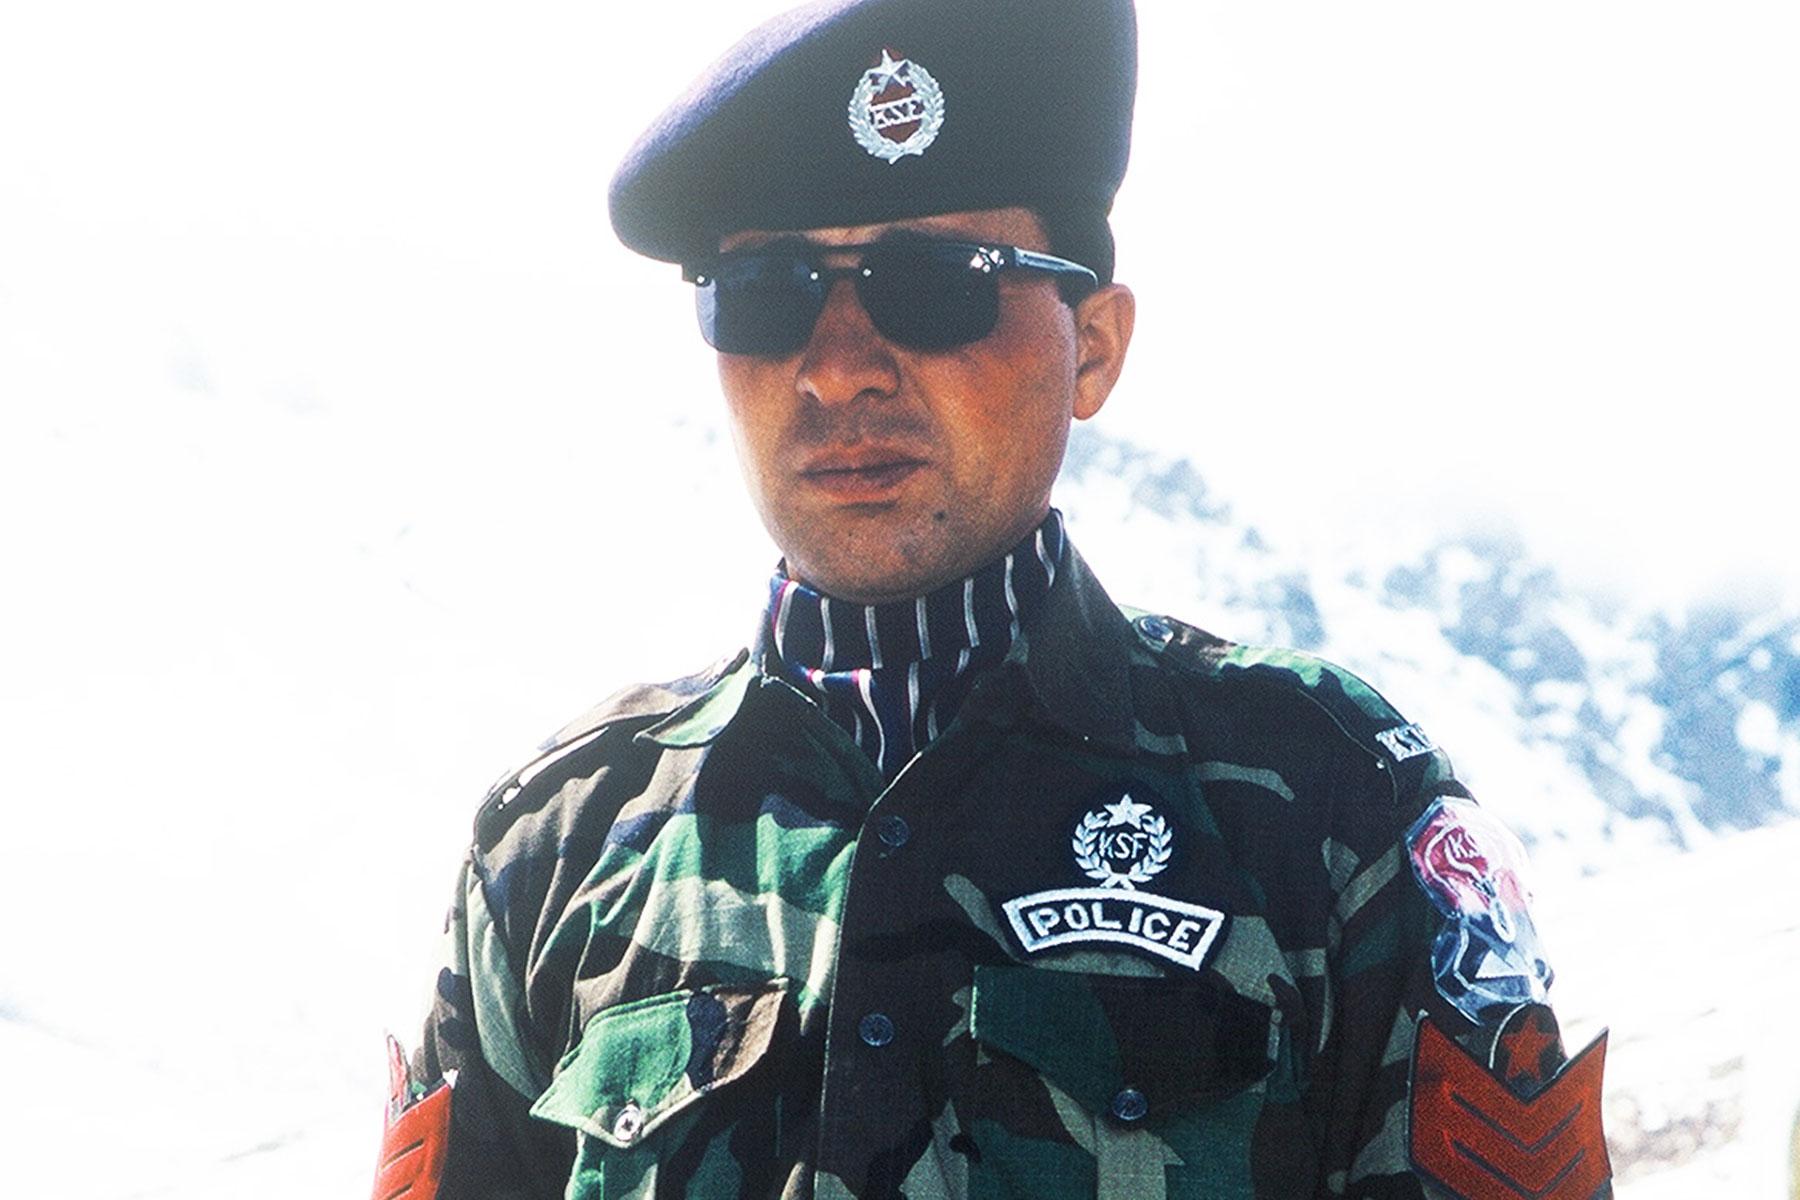 Sino-Pakistani border police - Pakistan Photo Journal - Steven Andrew Martin - Silk Road - Eastern Civilization